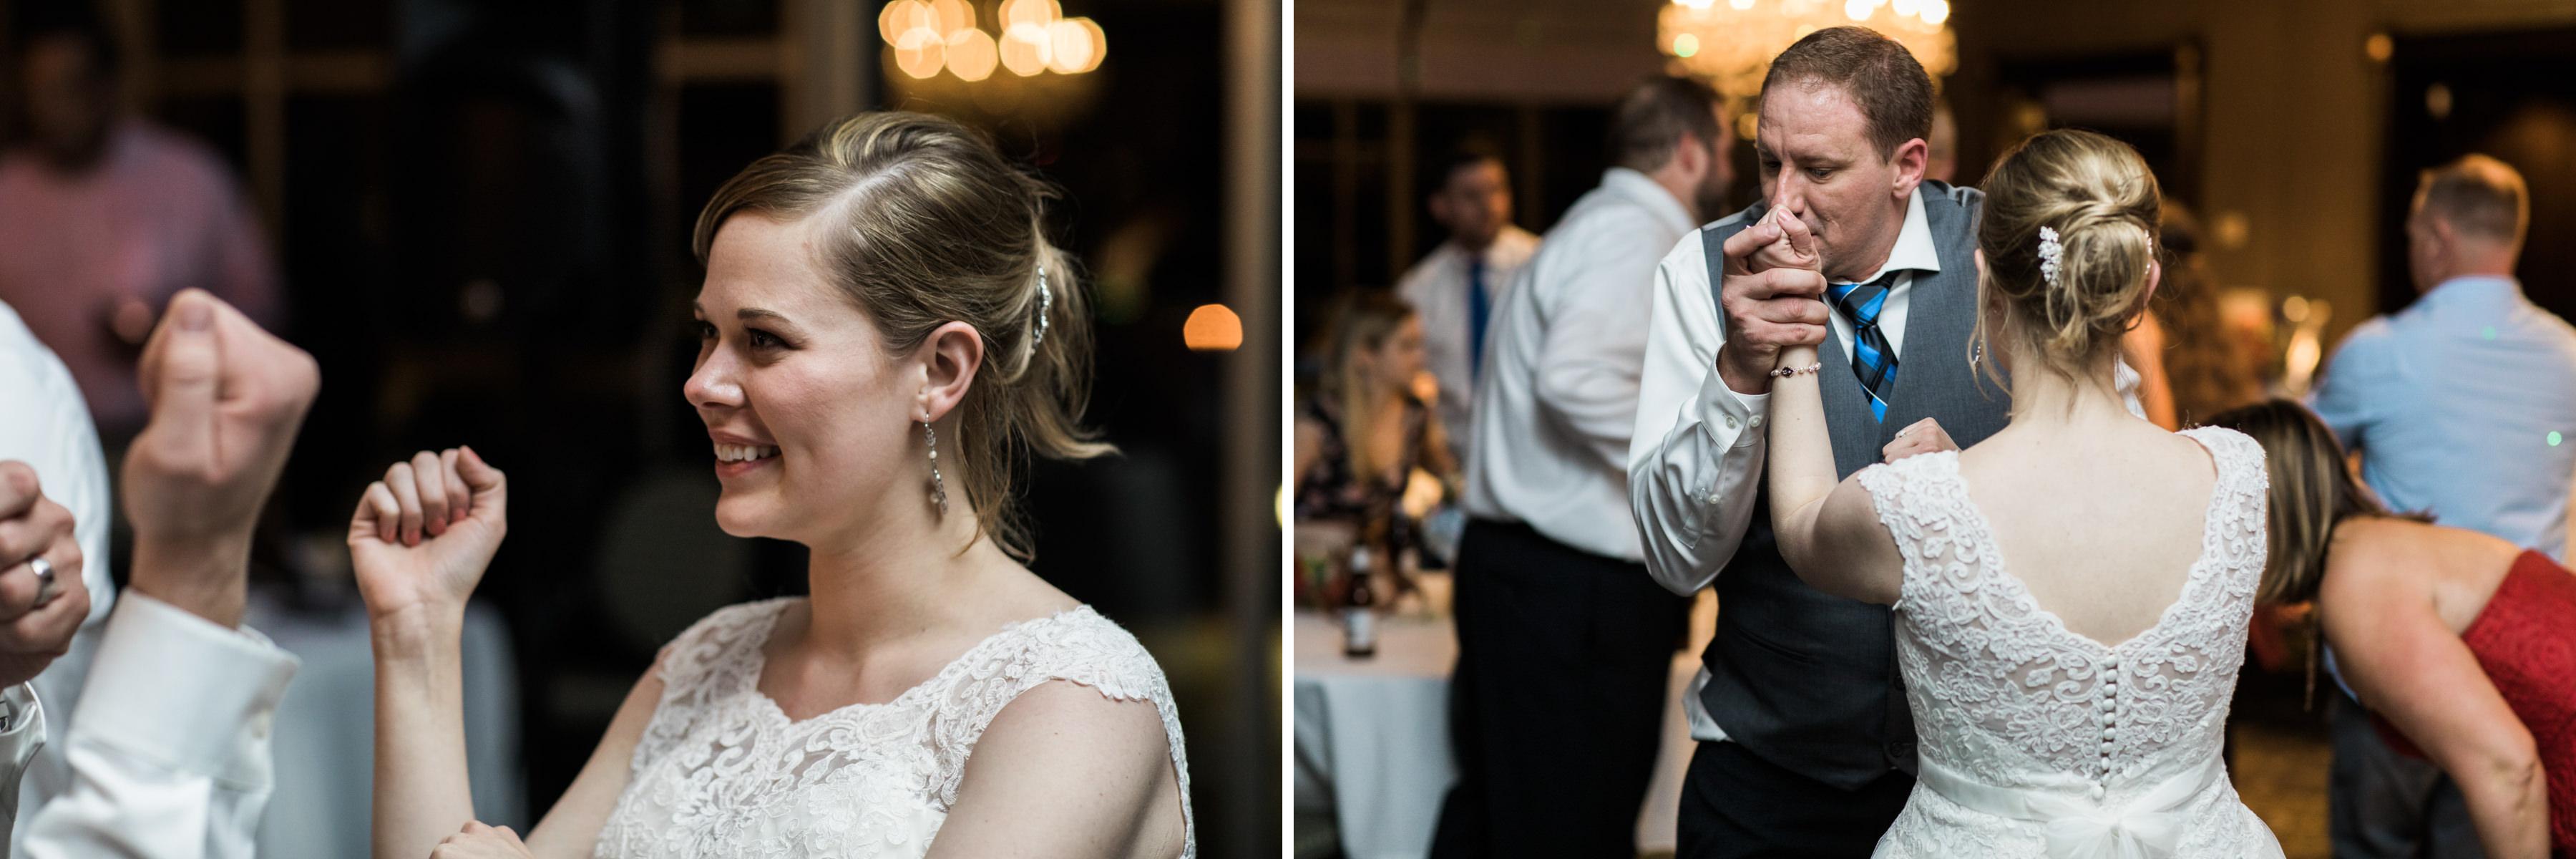 MAULDIN_WEDDING_MONTGOMERY_ALABAMA_WEDDING_PHOTOGRAPHY_134